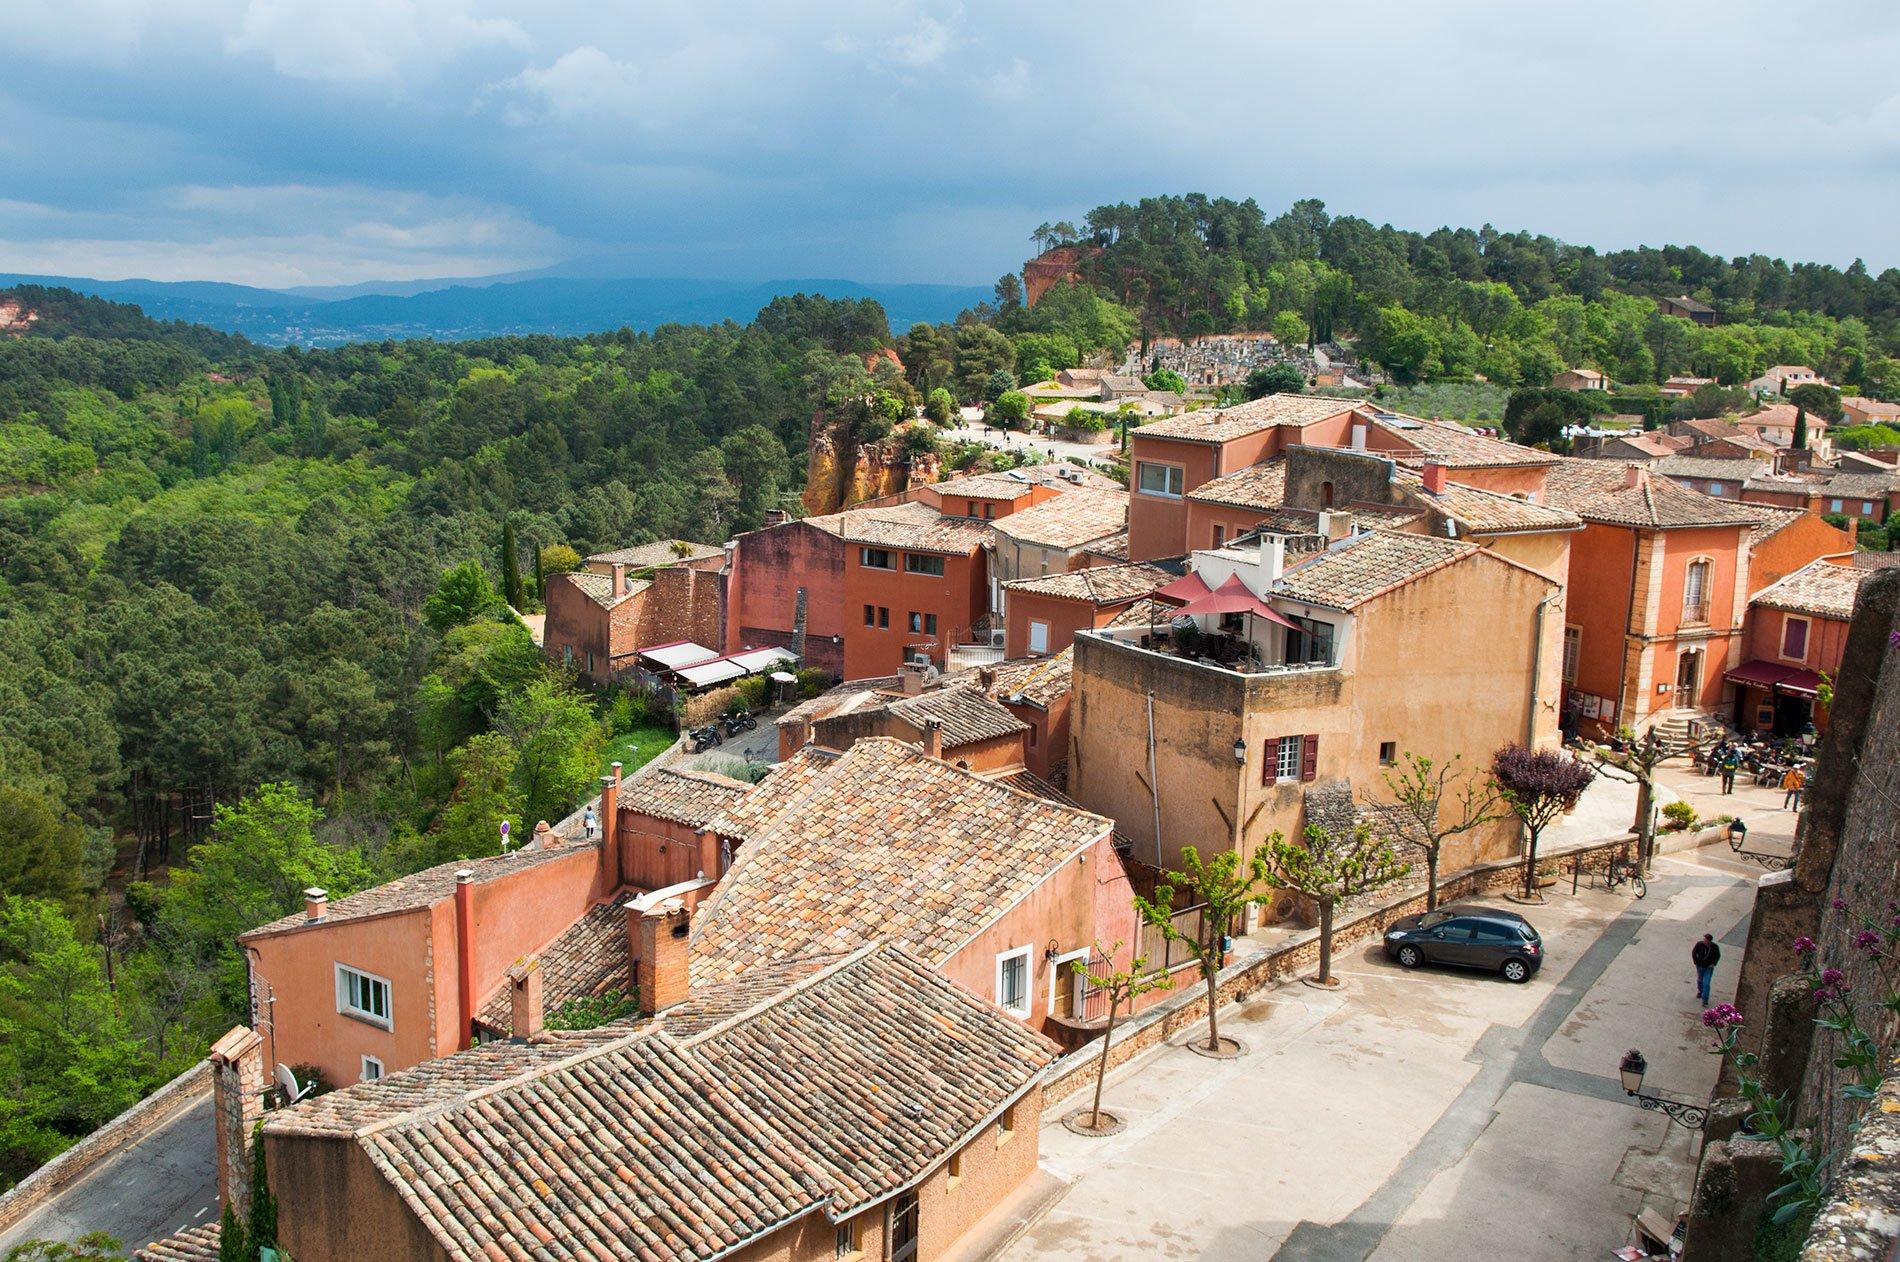 Roussillon en Provence - 22 v'la Scarlett